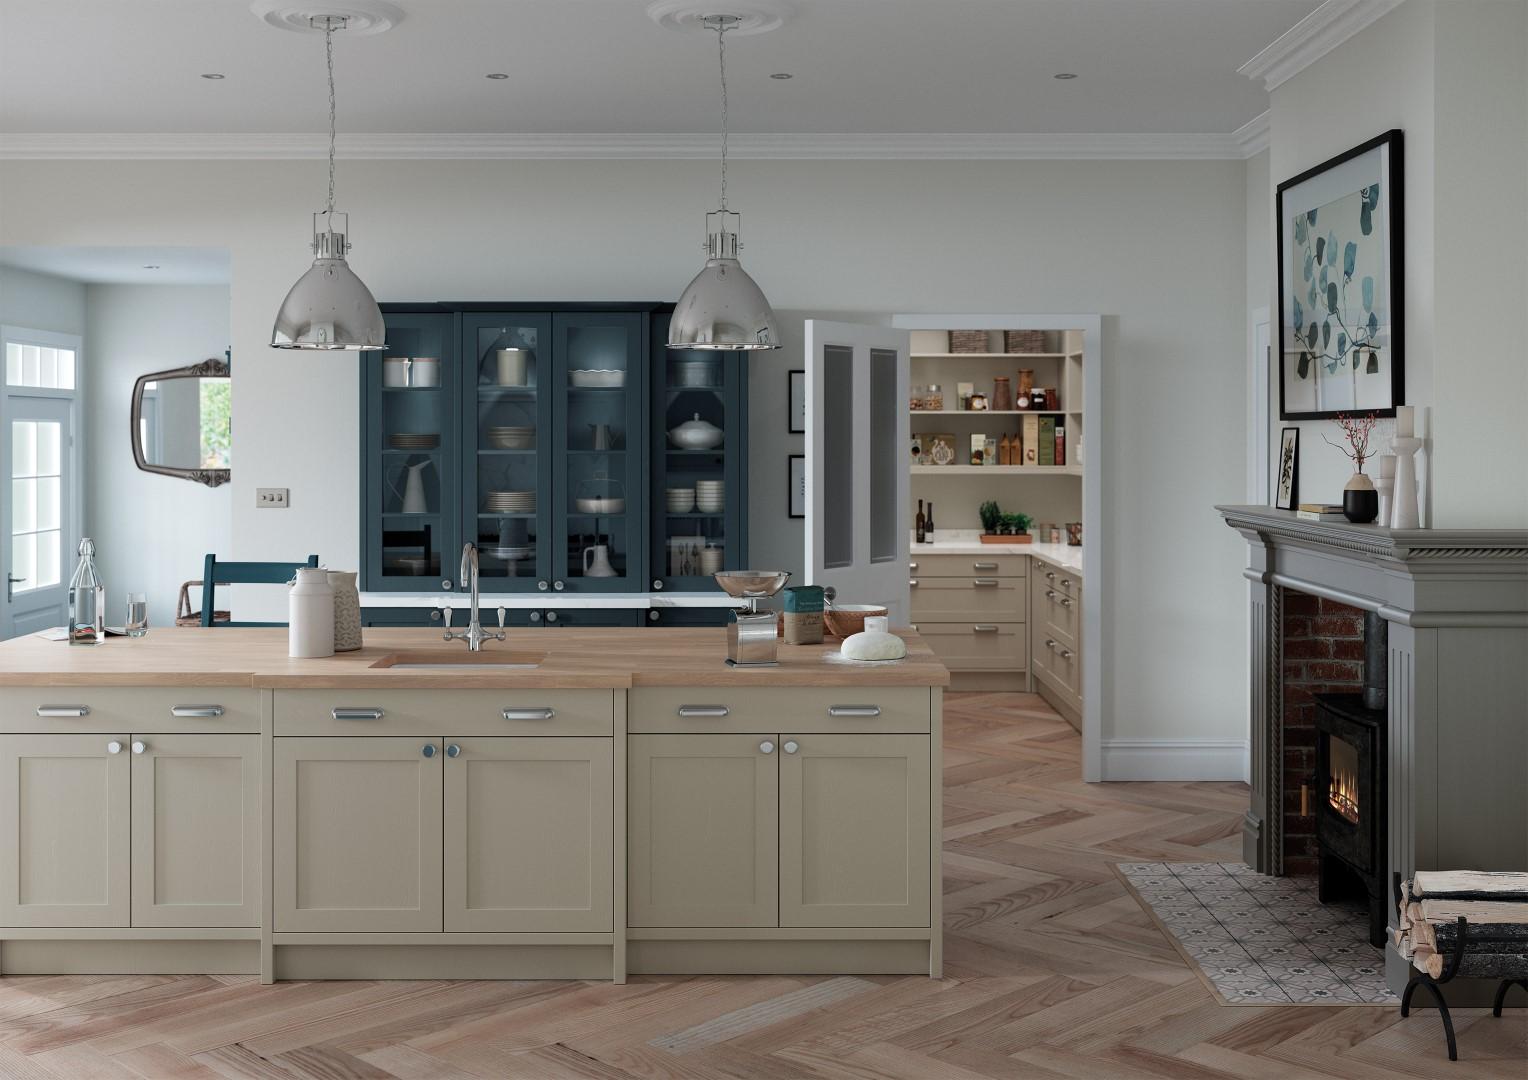 Aldana Stone and Marine - Kitchen Design - Alan Kelly Kitchens - Waterford - 2